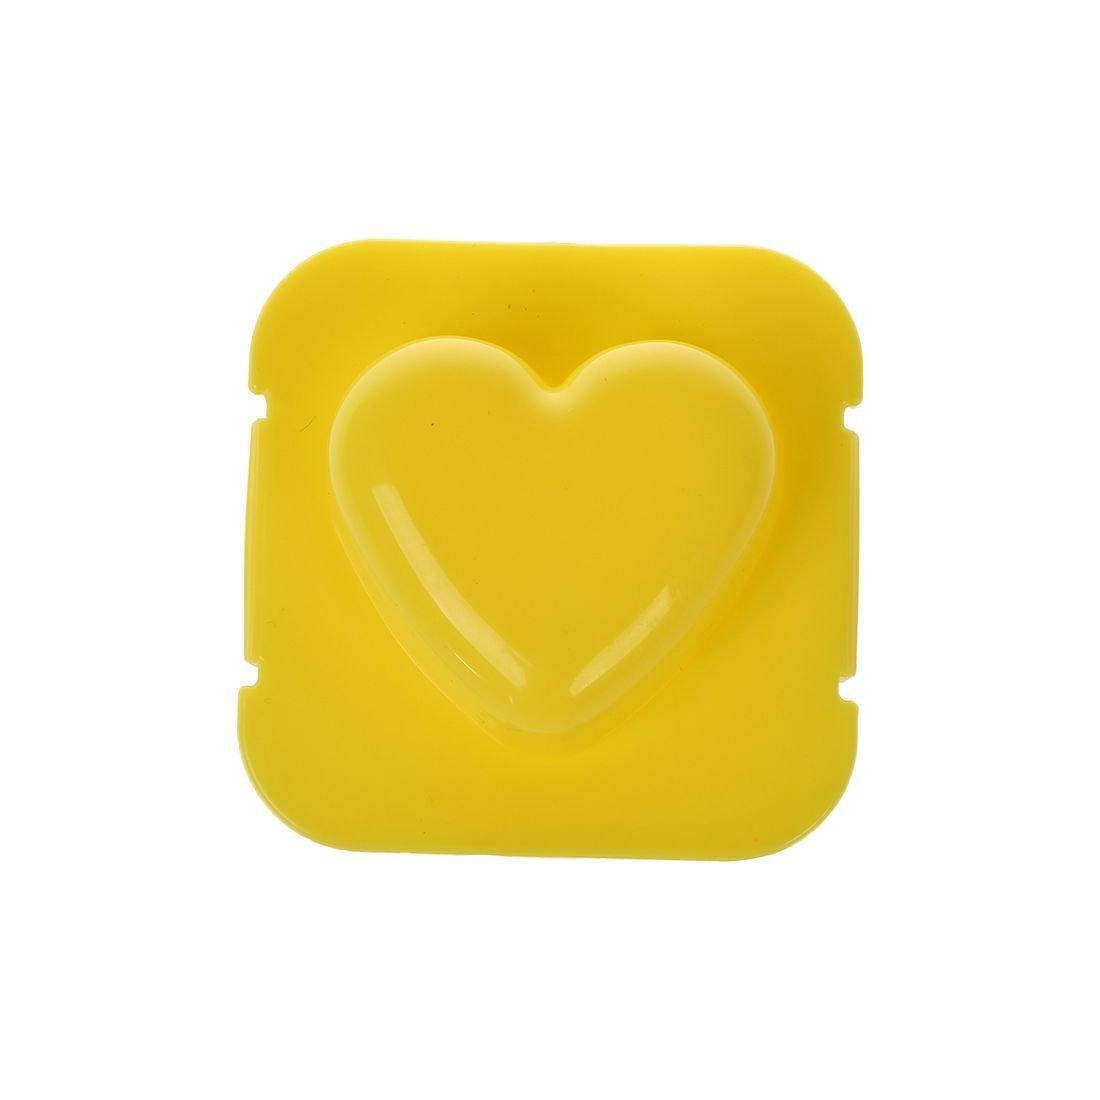 Xigeapg Yellow Heart Style Onigiri Sushi Mold Tray Rice Ball Maker